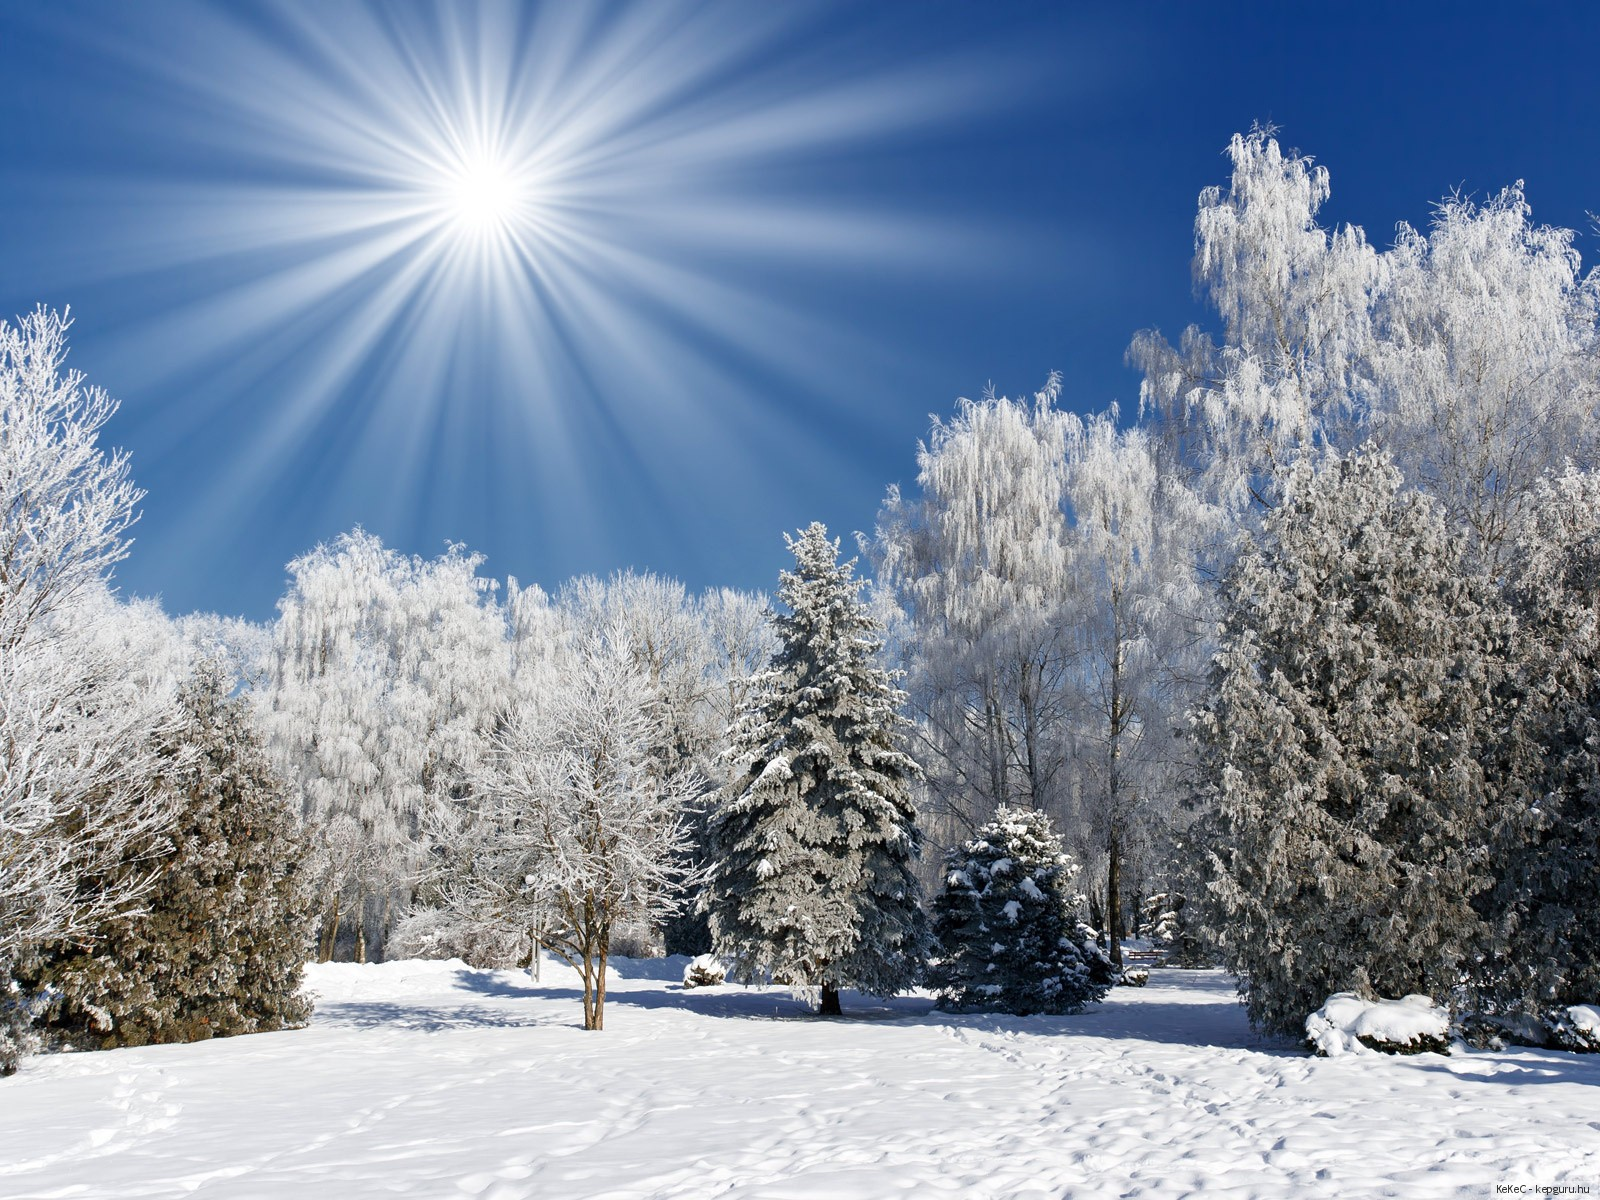 Wallpaper ไหนว่าปีนี้จะหนาวสุดในรอบ 30 ปี 50 Pic 230901-svetik